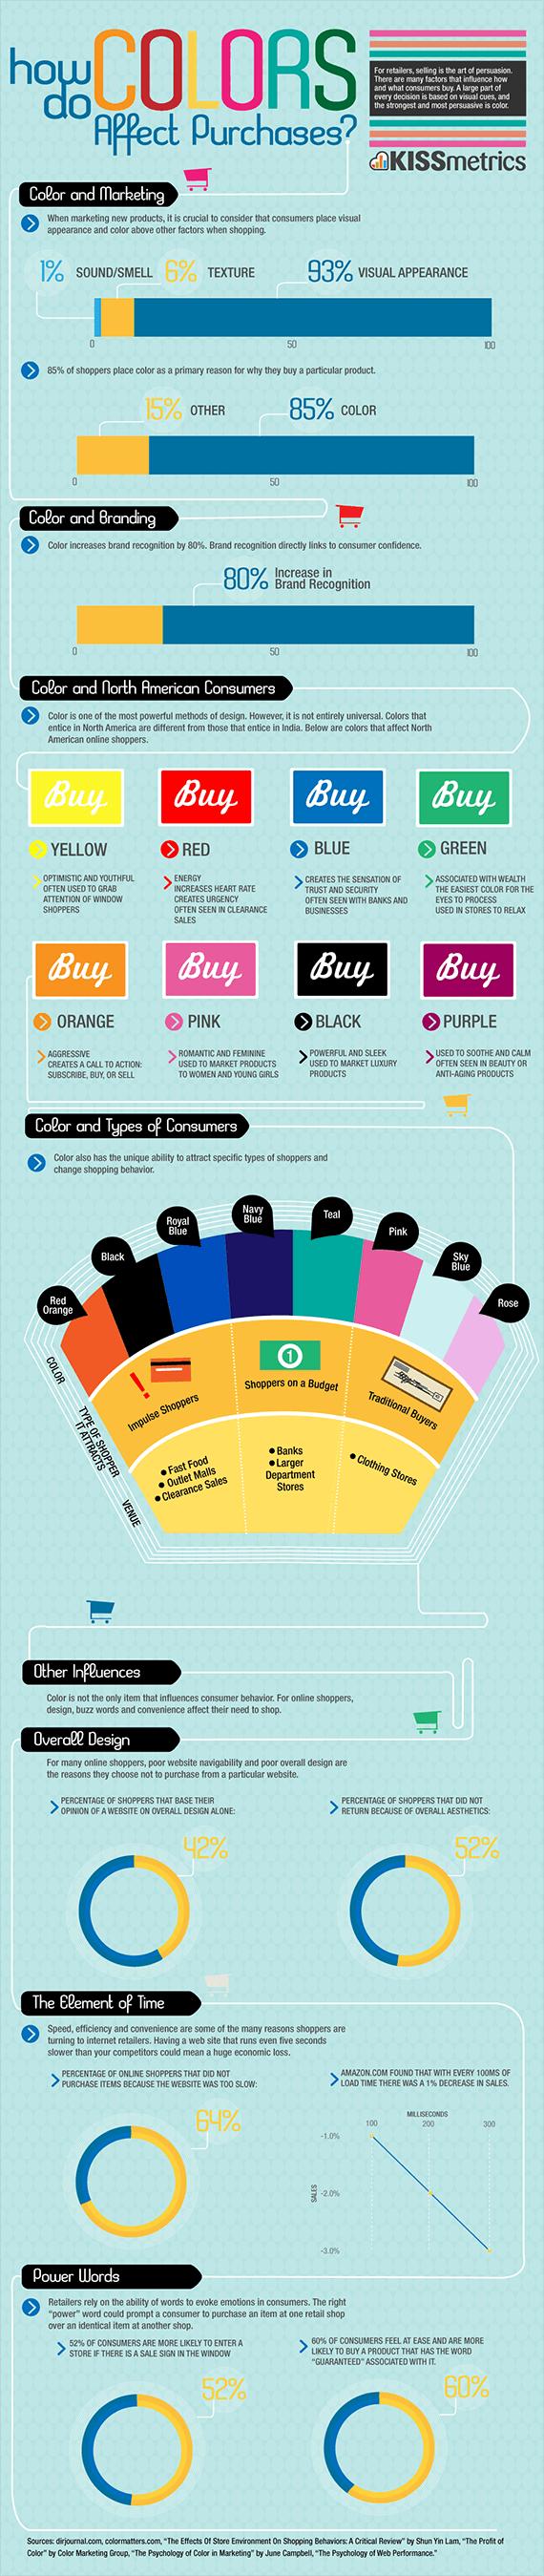 I colori e le decisioni d_acquisto infografica Kiss Metrics